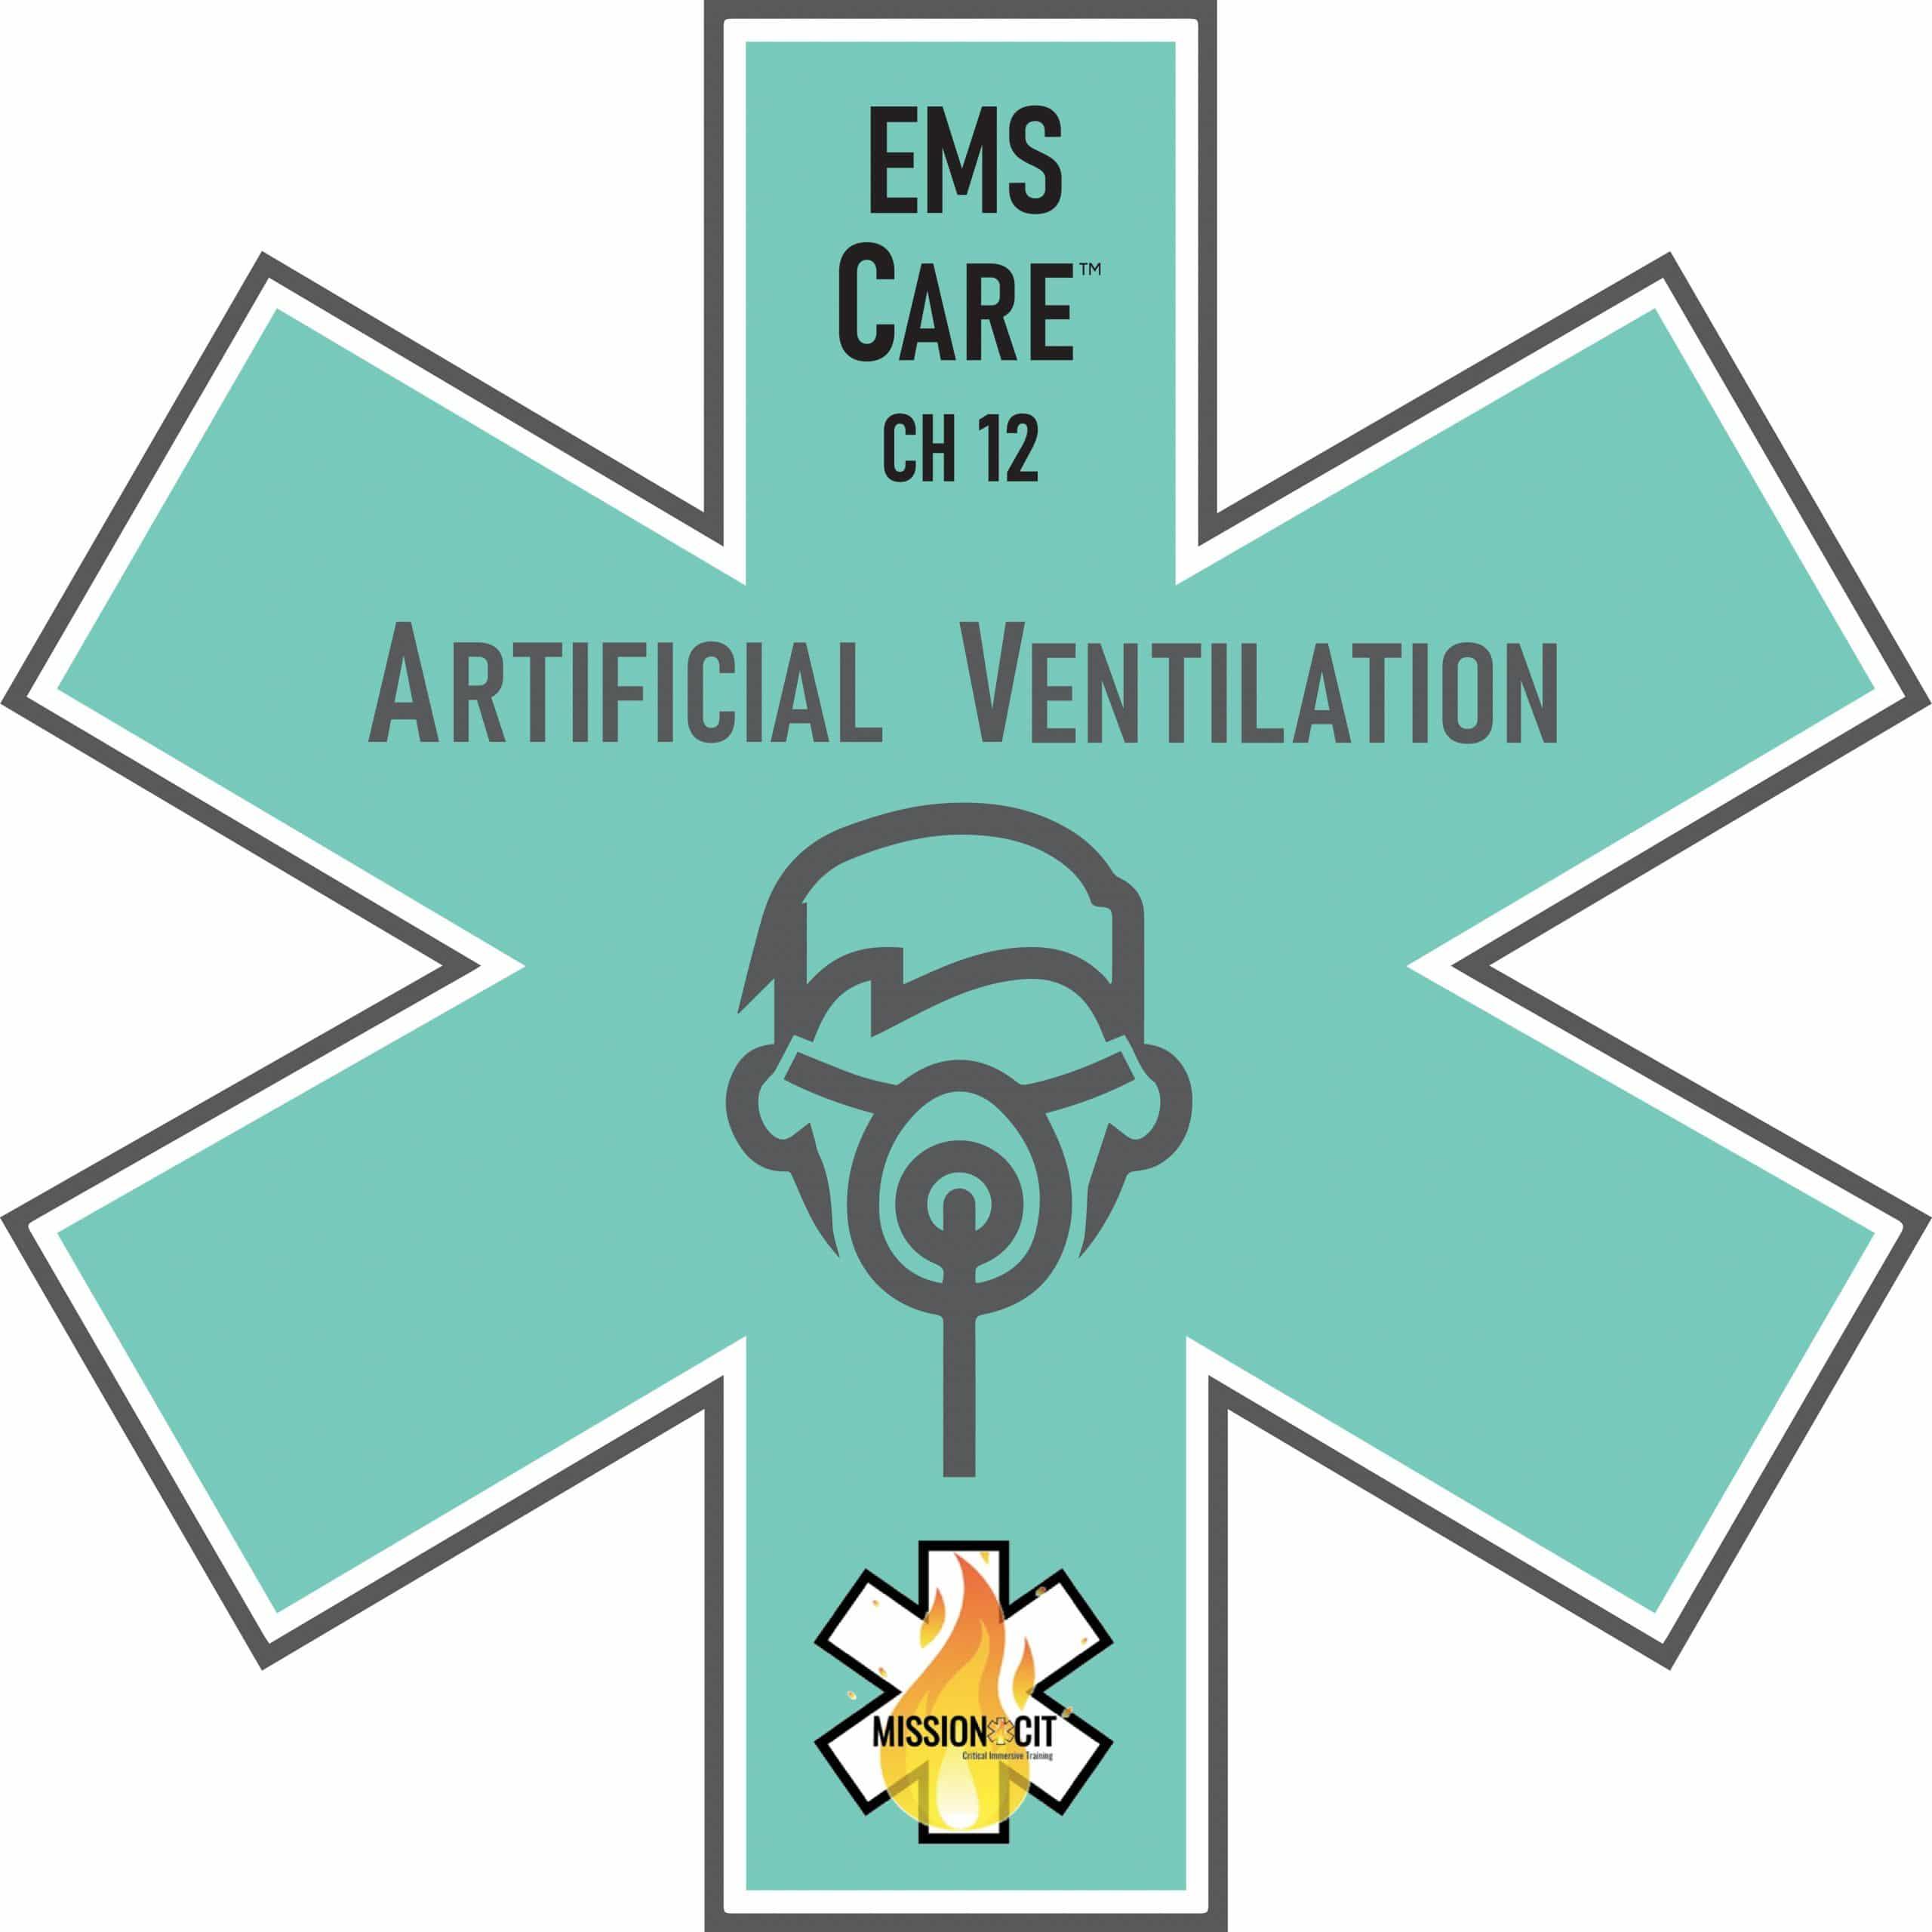 EMT respiration and artificial ventilation